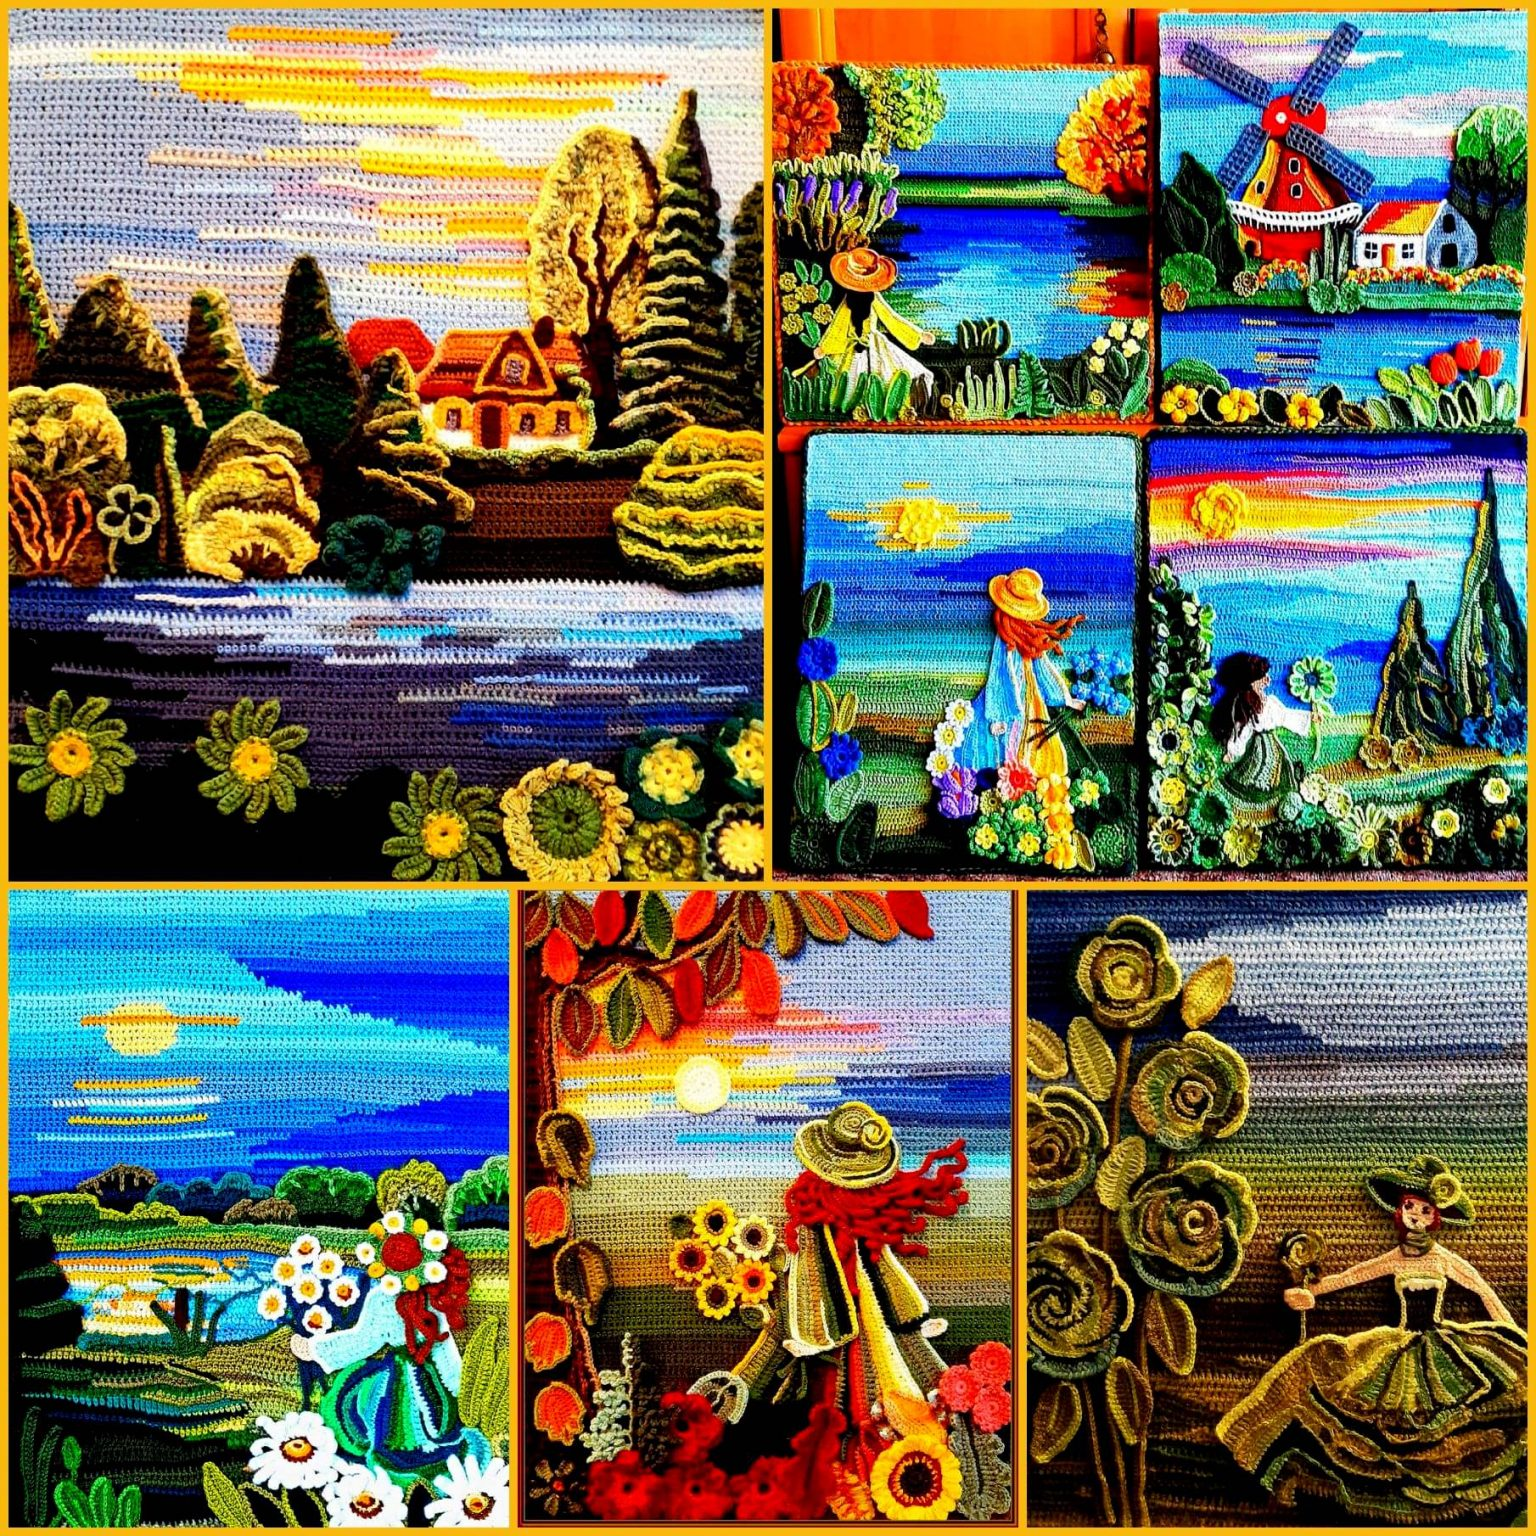 Вязаные картины крючком от Beata Bylinka